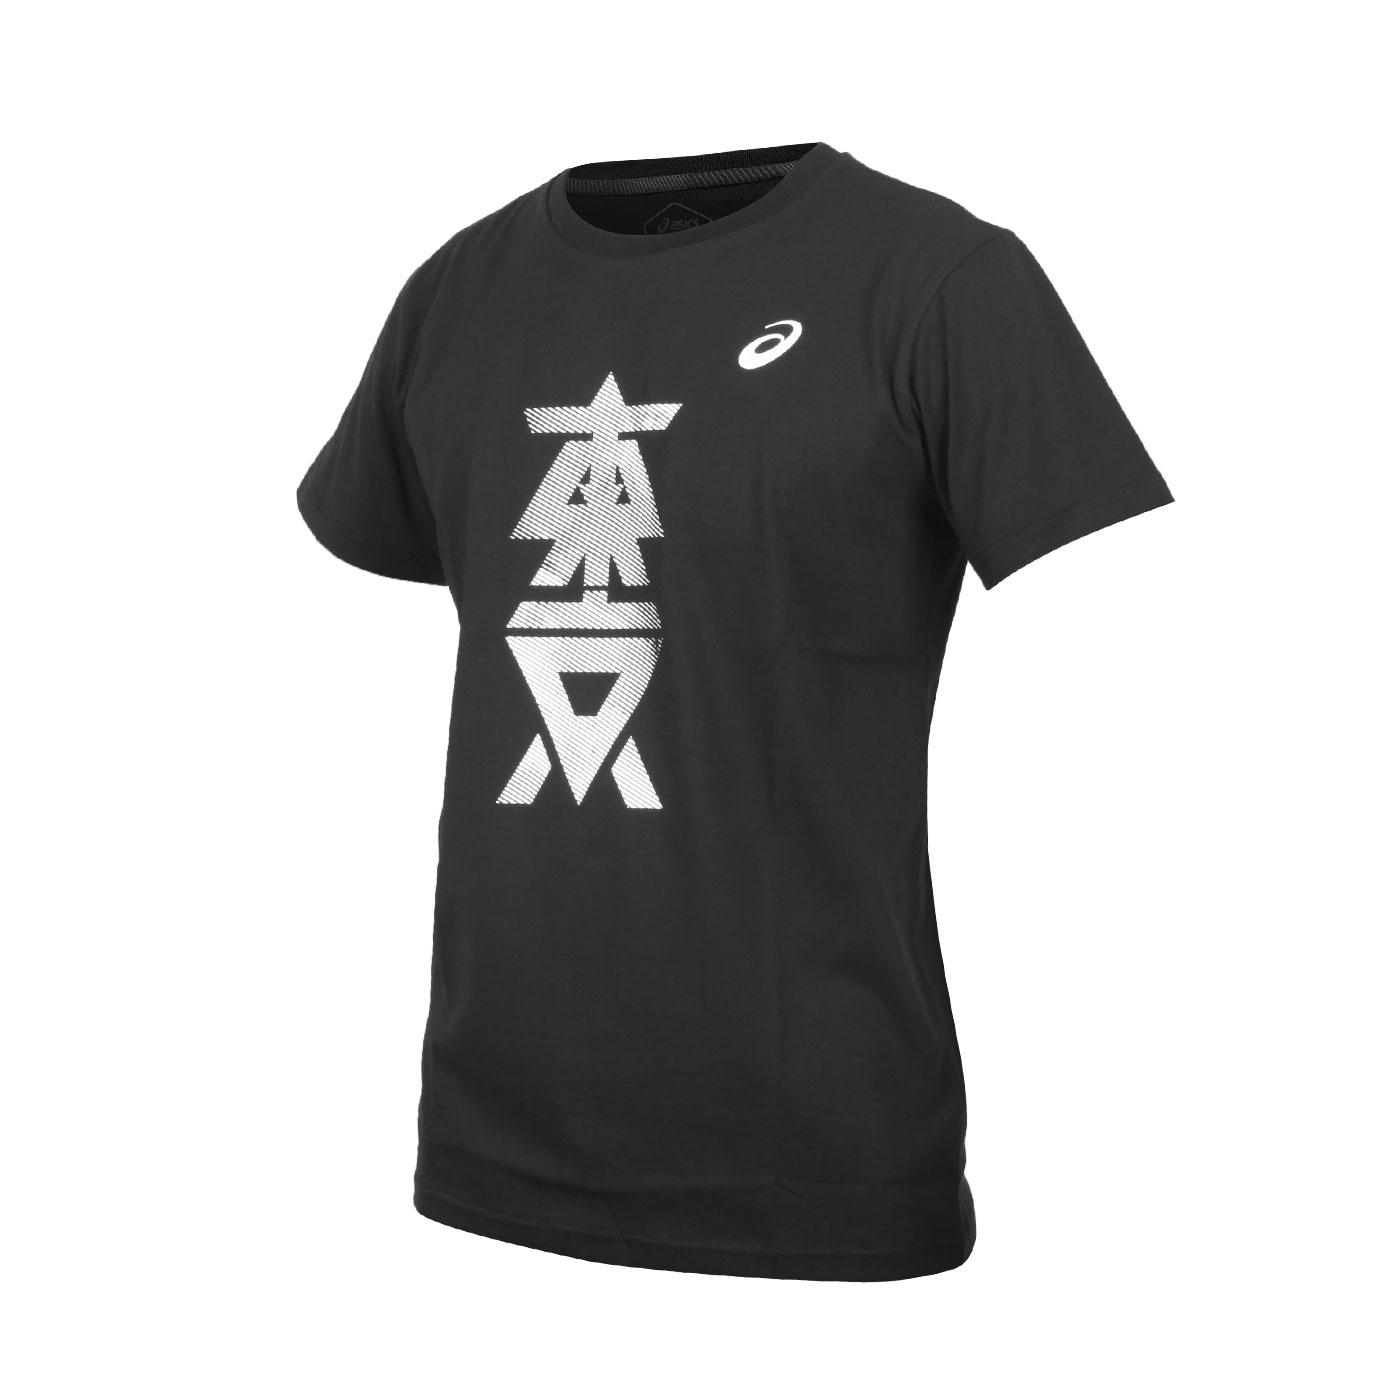 ASICS 男款短袖T恤 2031B815-001 - 黑白